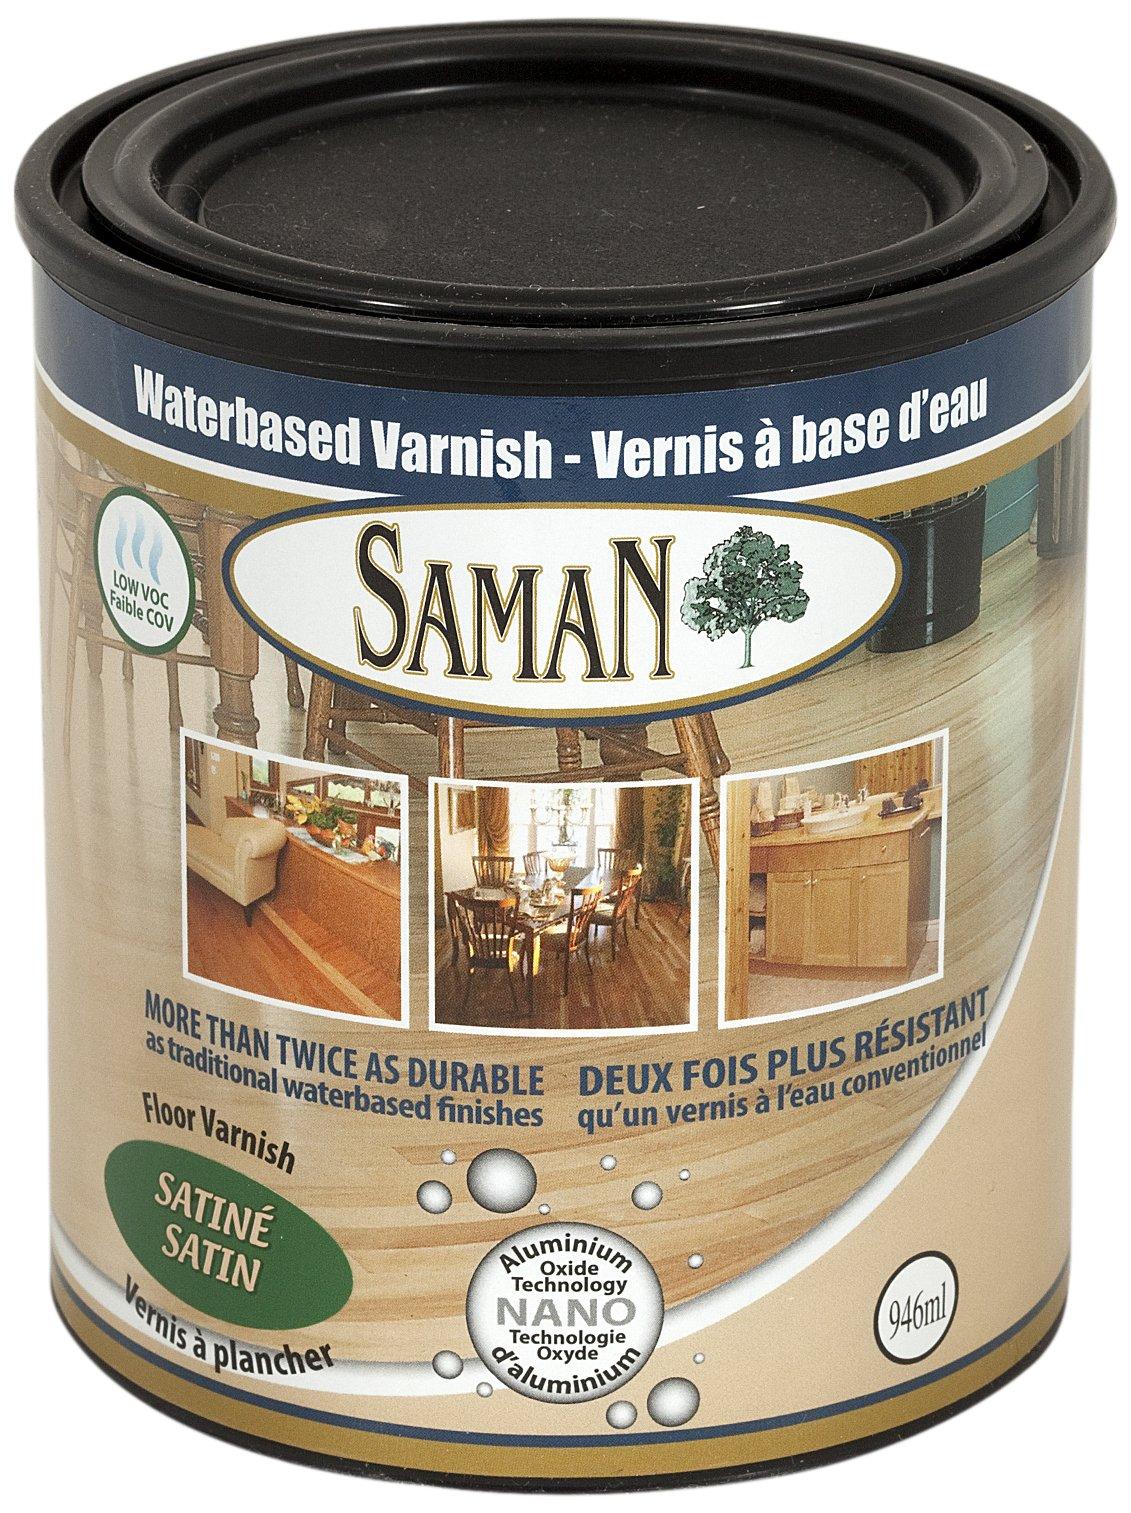 SamaN 160-031-1L 1-Quart Interior Water Based Satin Varnish with Aluminum oxide by SamaN (Image #1)